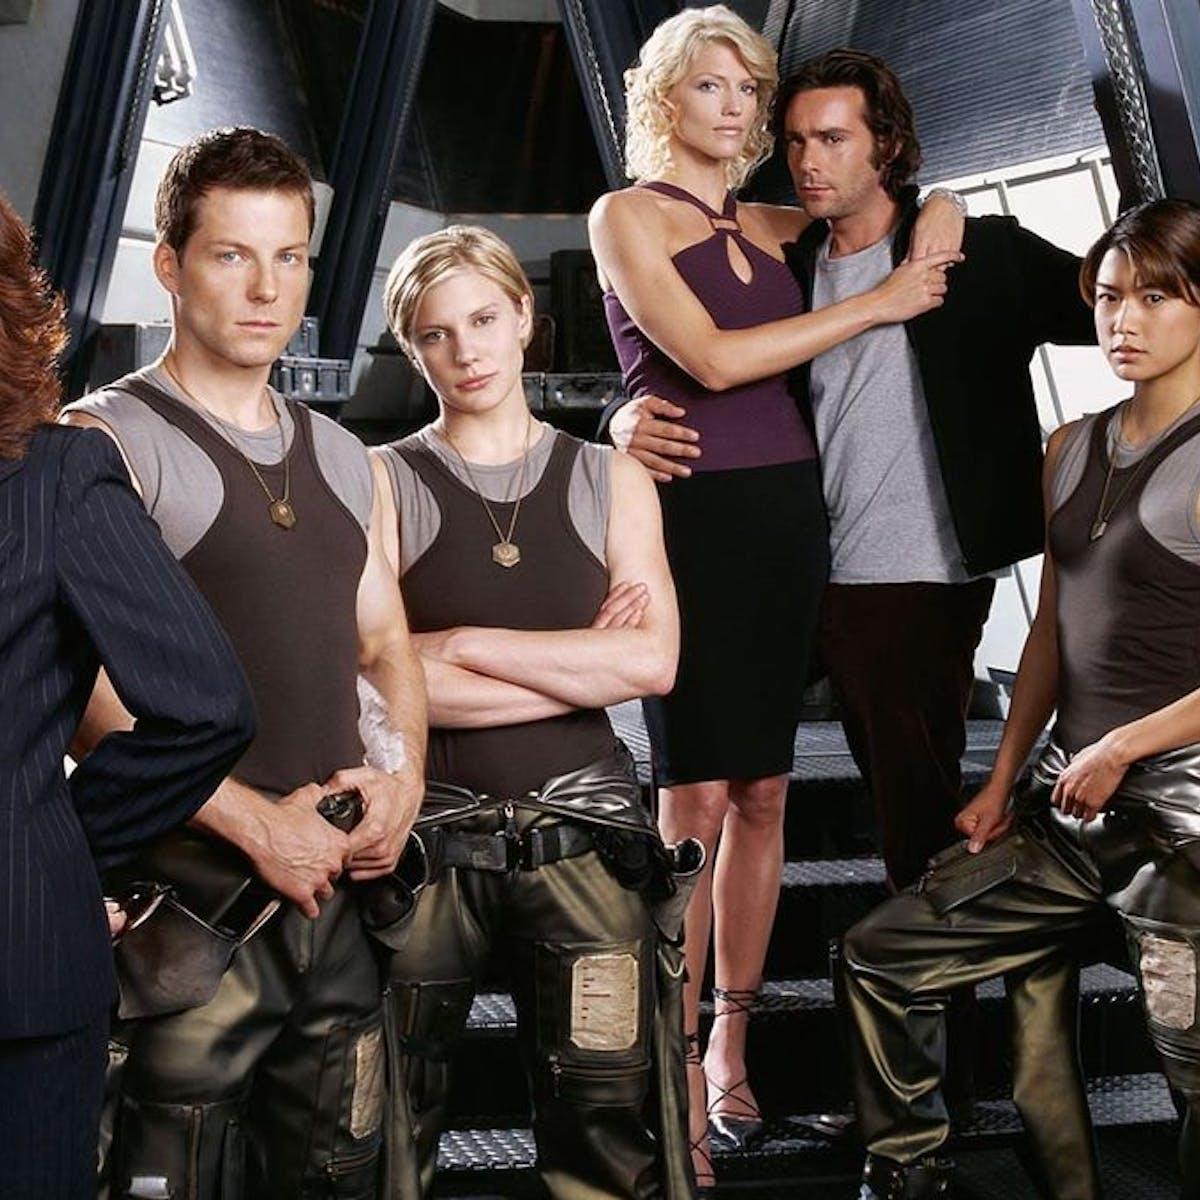 'Battlestar Galactica' 2019 reboot isn't worth the fraking risk. Or is it?